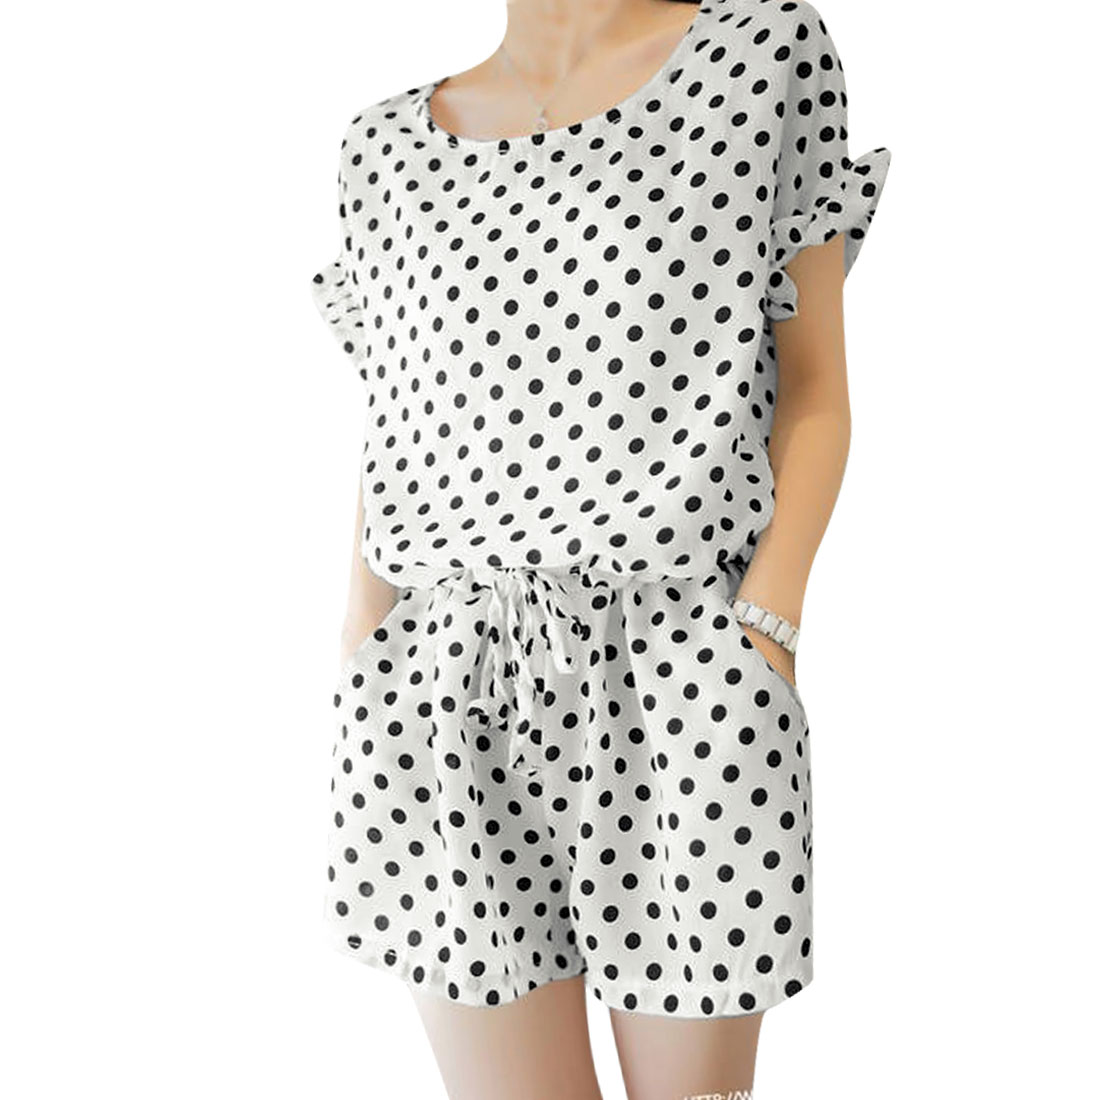 Ladies Dots Prints Chiffon Hidden Zipper Back Romper White M